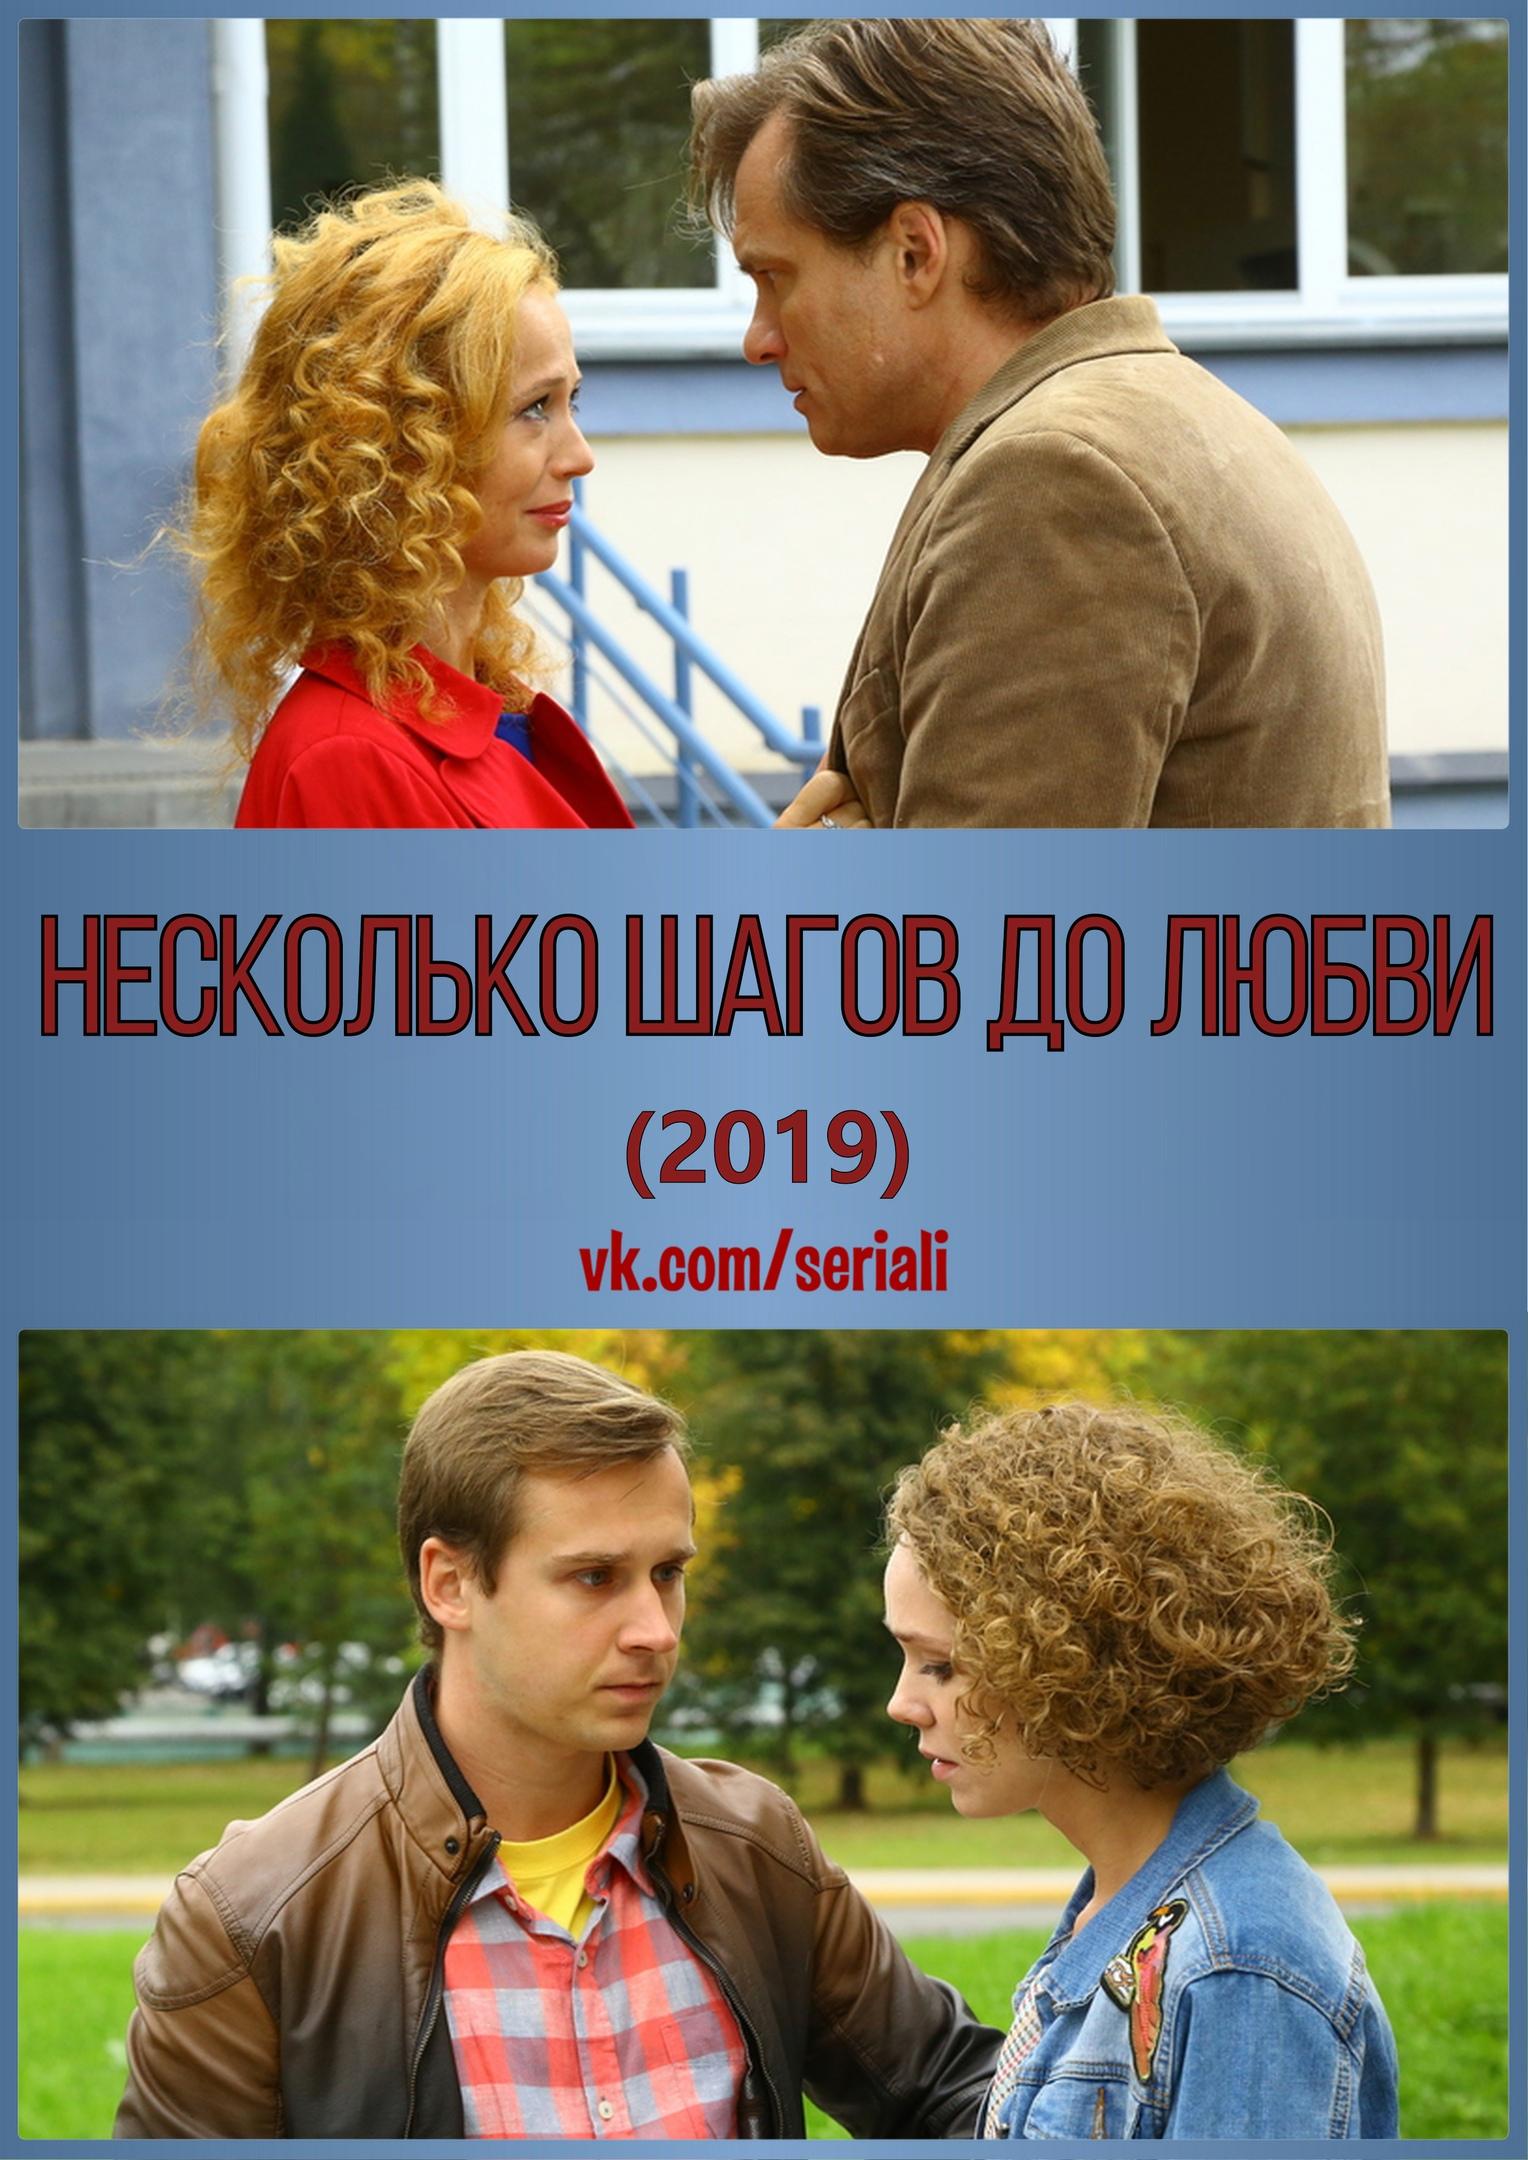 Мелодрама «Hecкoлькo шaгoв дo любви» (2019) 1-4 серия из 4 HD